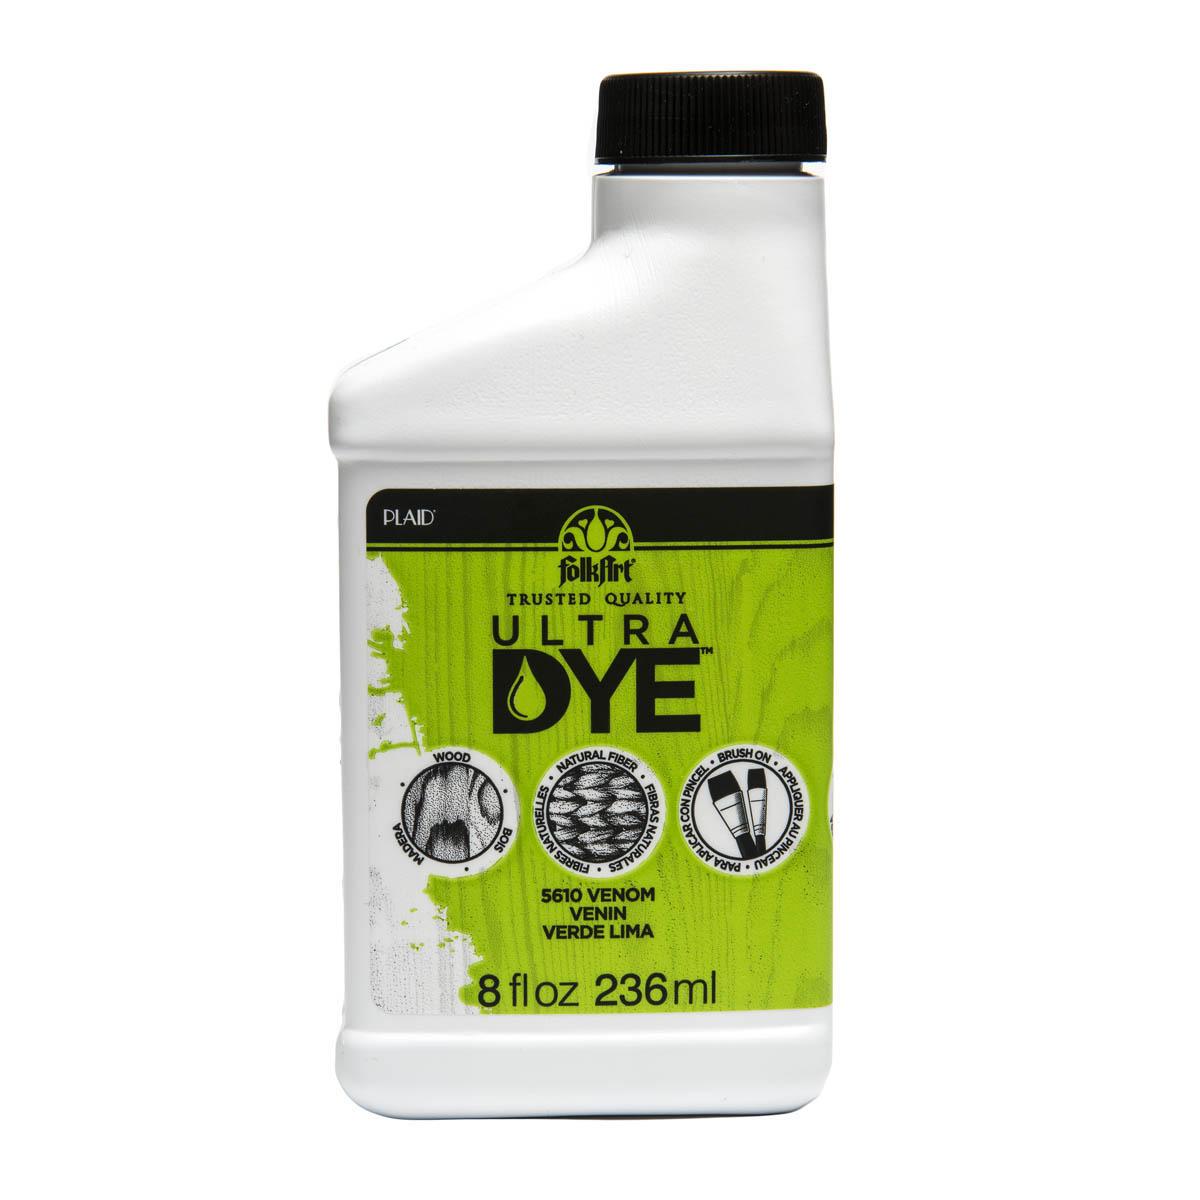 FolkArt ® Ultra Dye™ Colors - Venom, 8 oz. - 5610